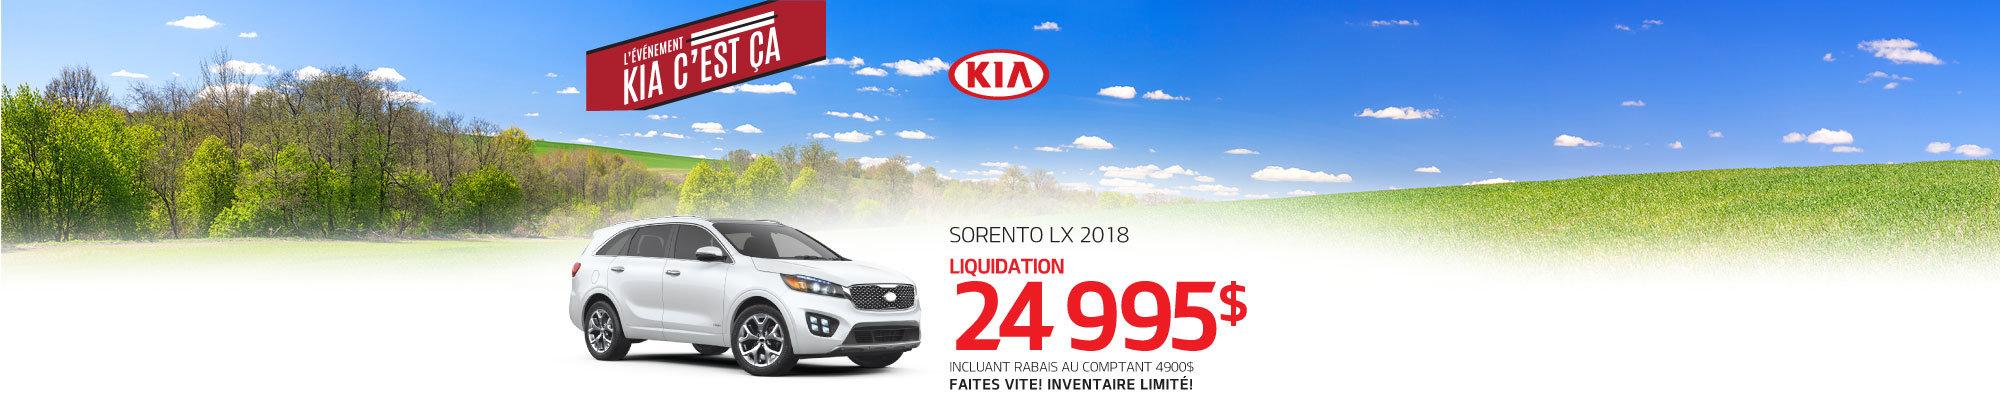 Sorento LX 2018 web